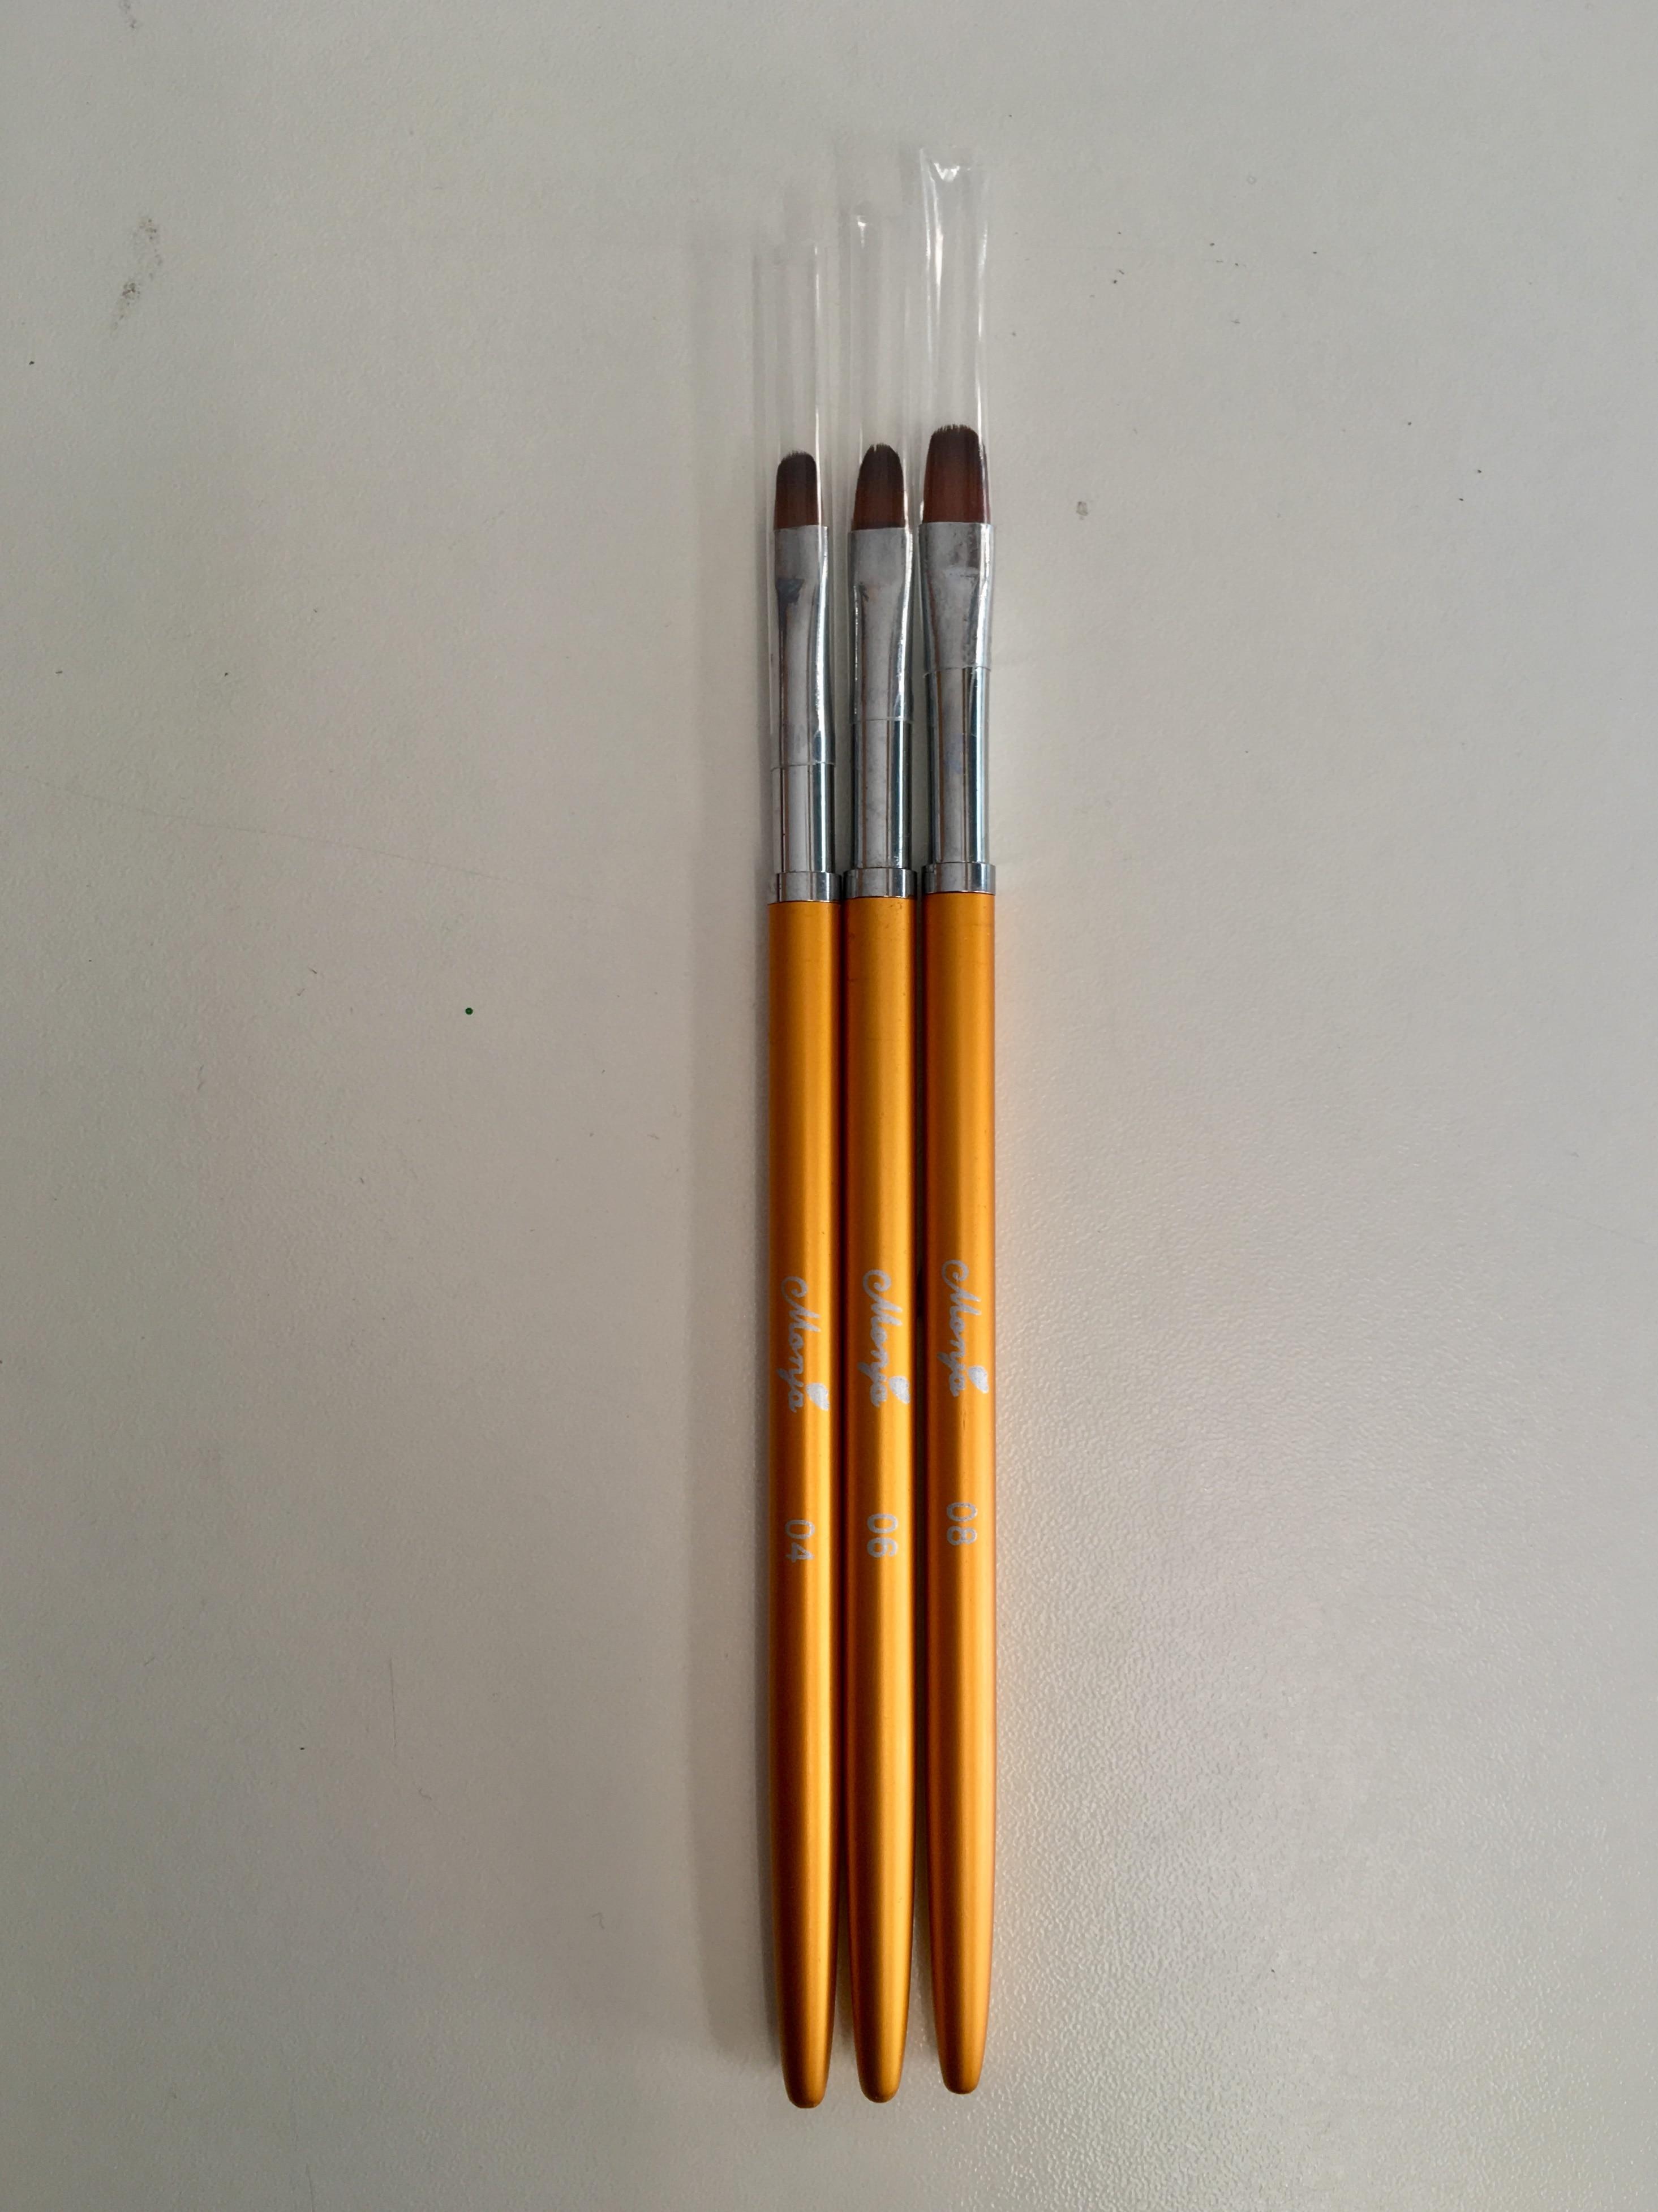 3 Size Nail Art Gold Round Top Painting Brush Set Gel Polish Tips Extending Coating 3D Petal Flower DIY Drawing Shaping Pens Kit reviews №2 161372